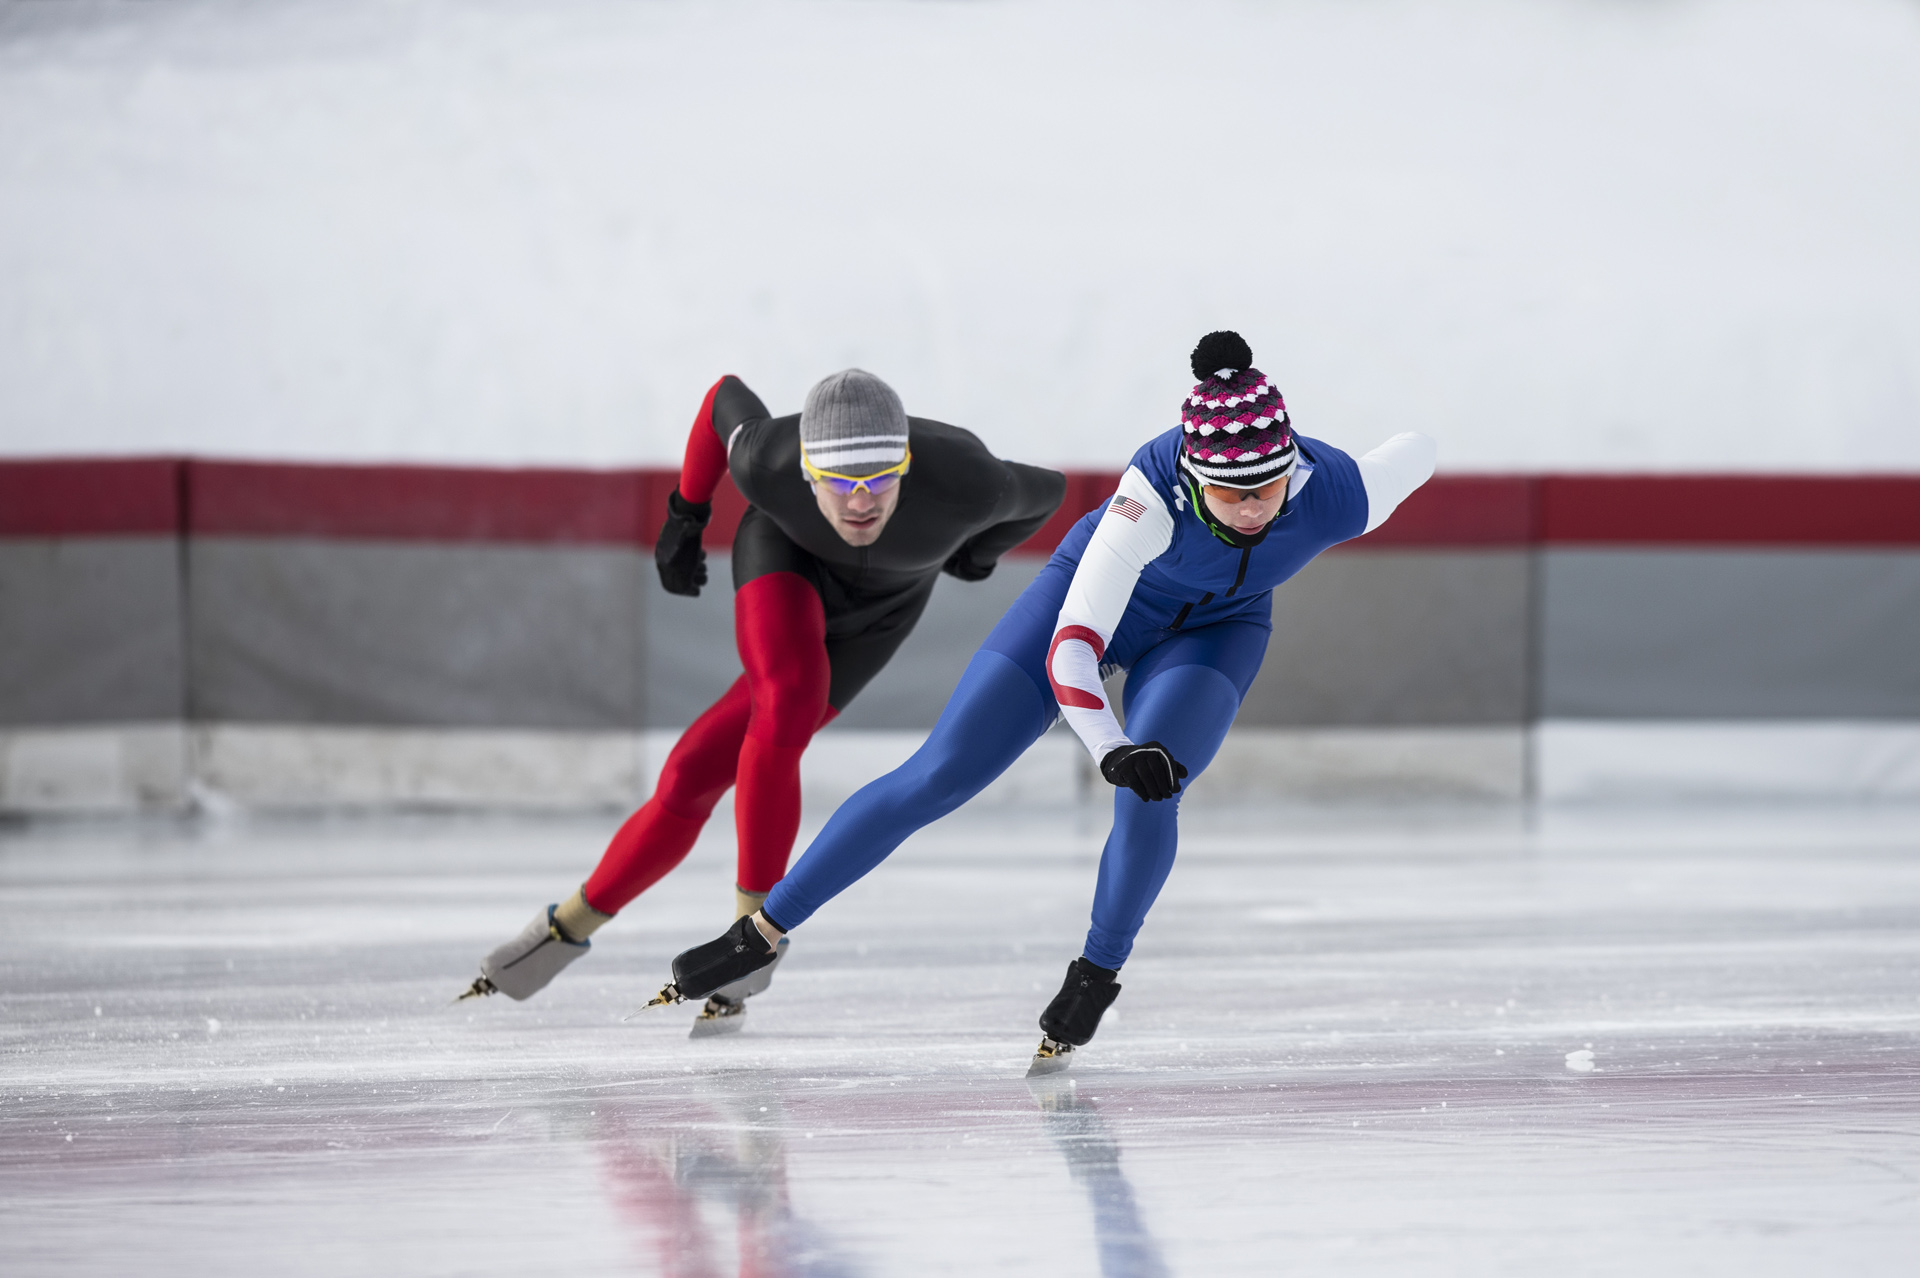 Winter fun schaatsen